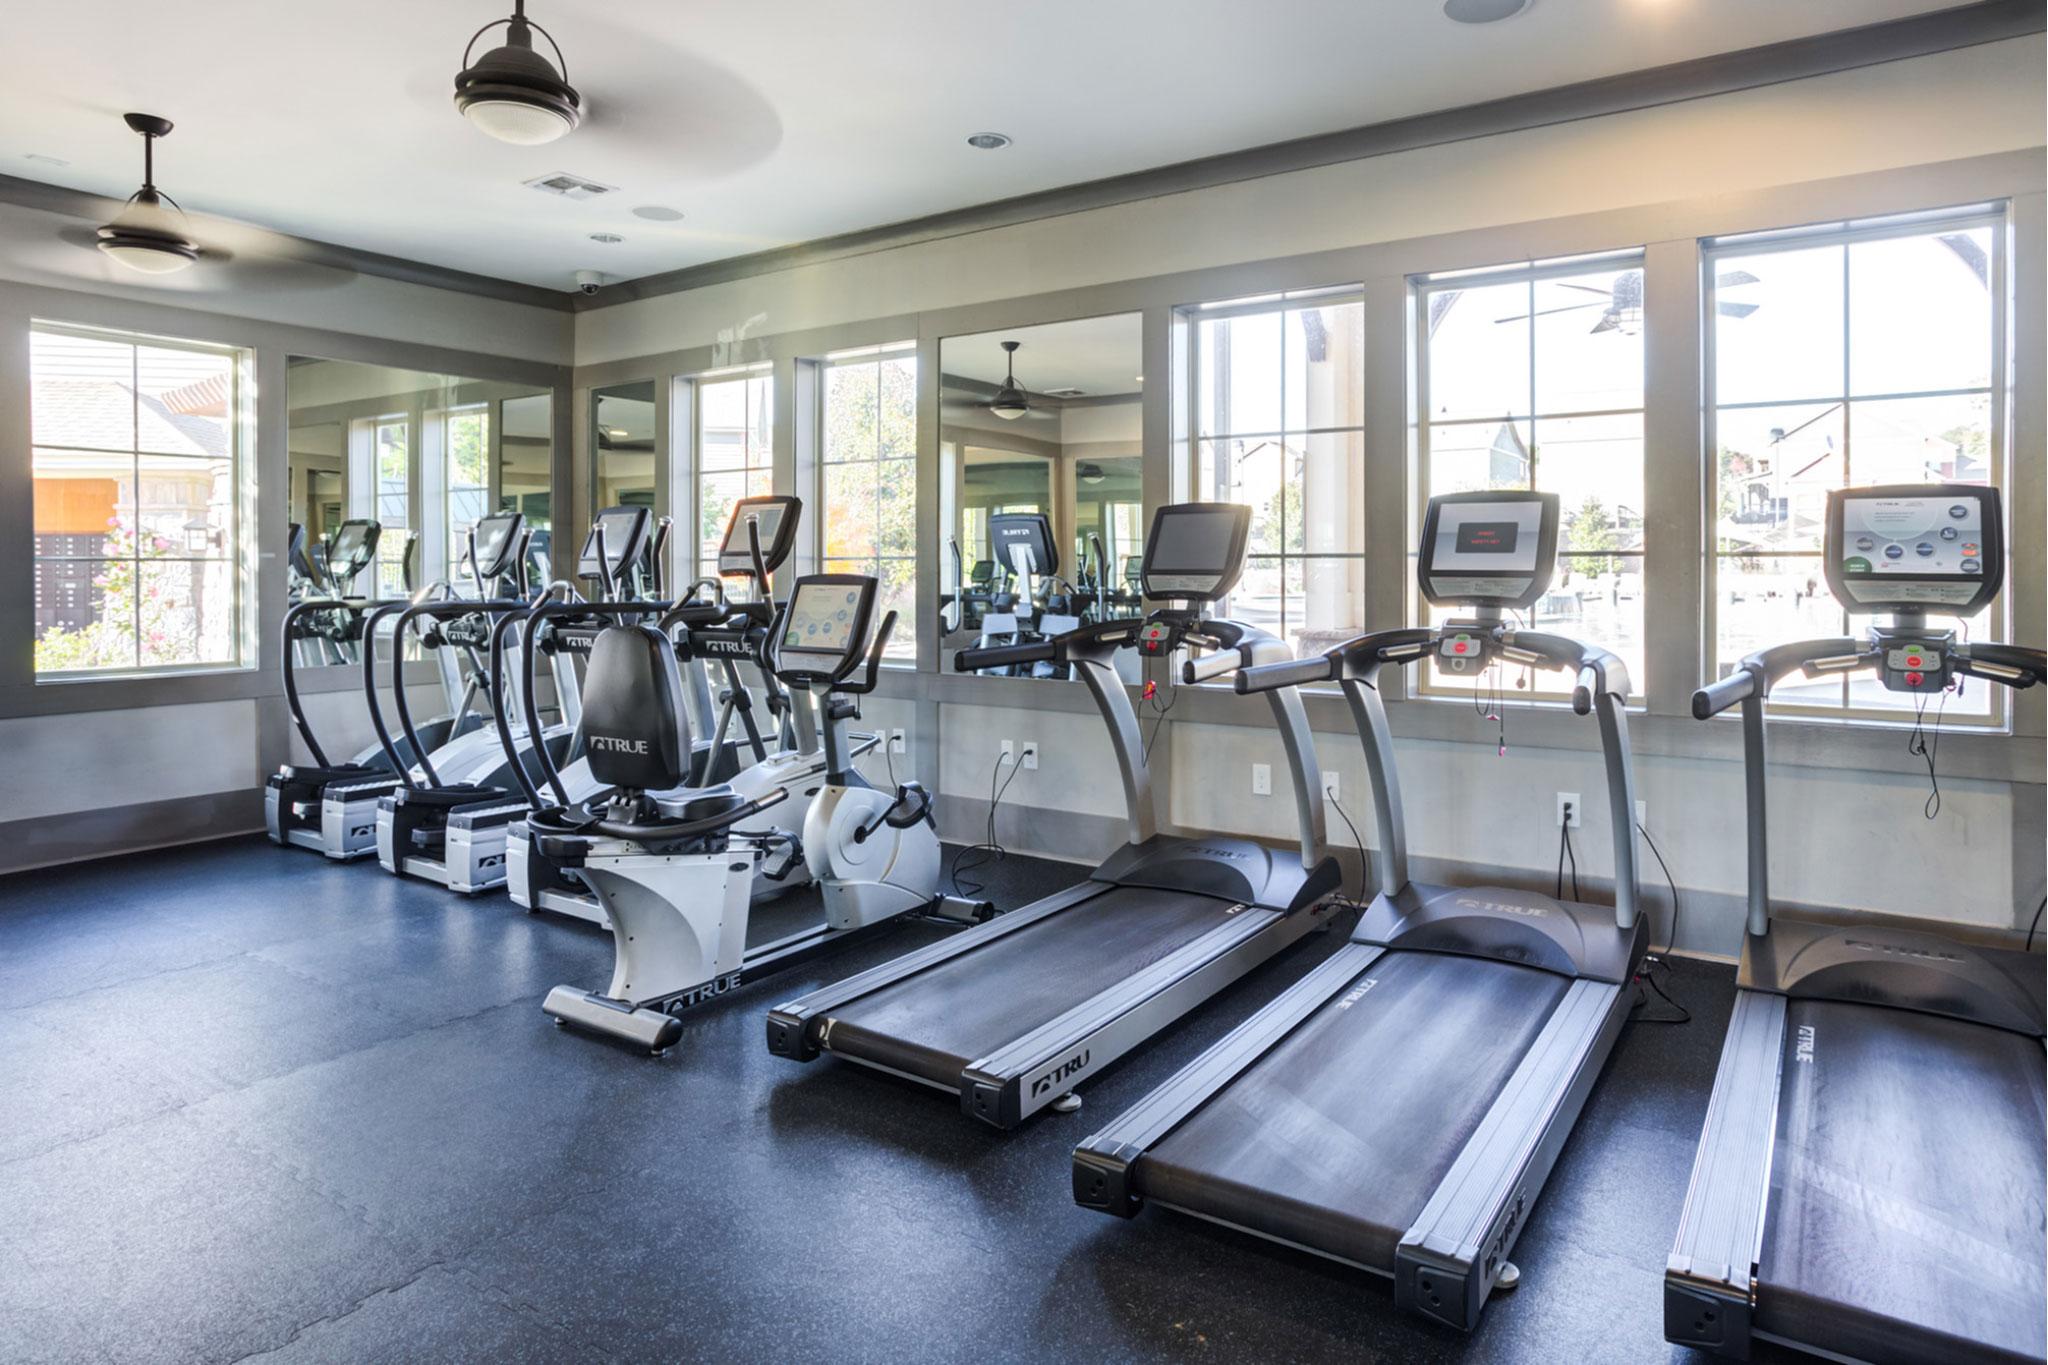 College Town Oxford Fitness Center Treadmills